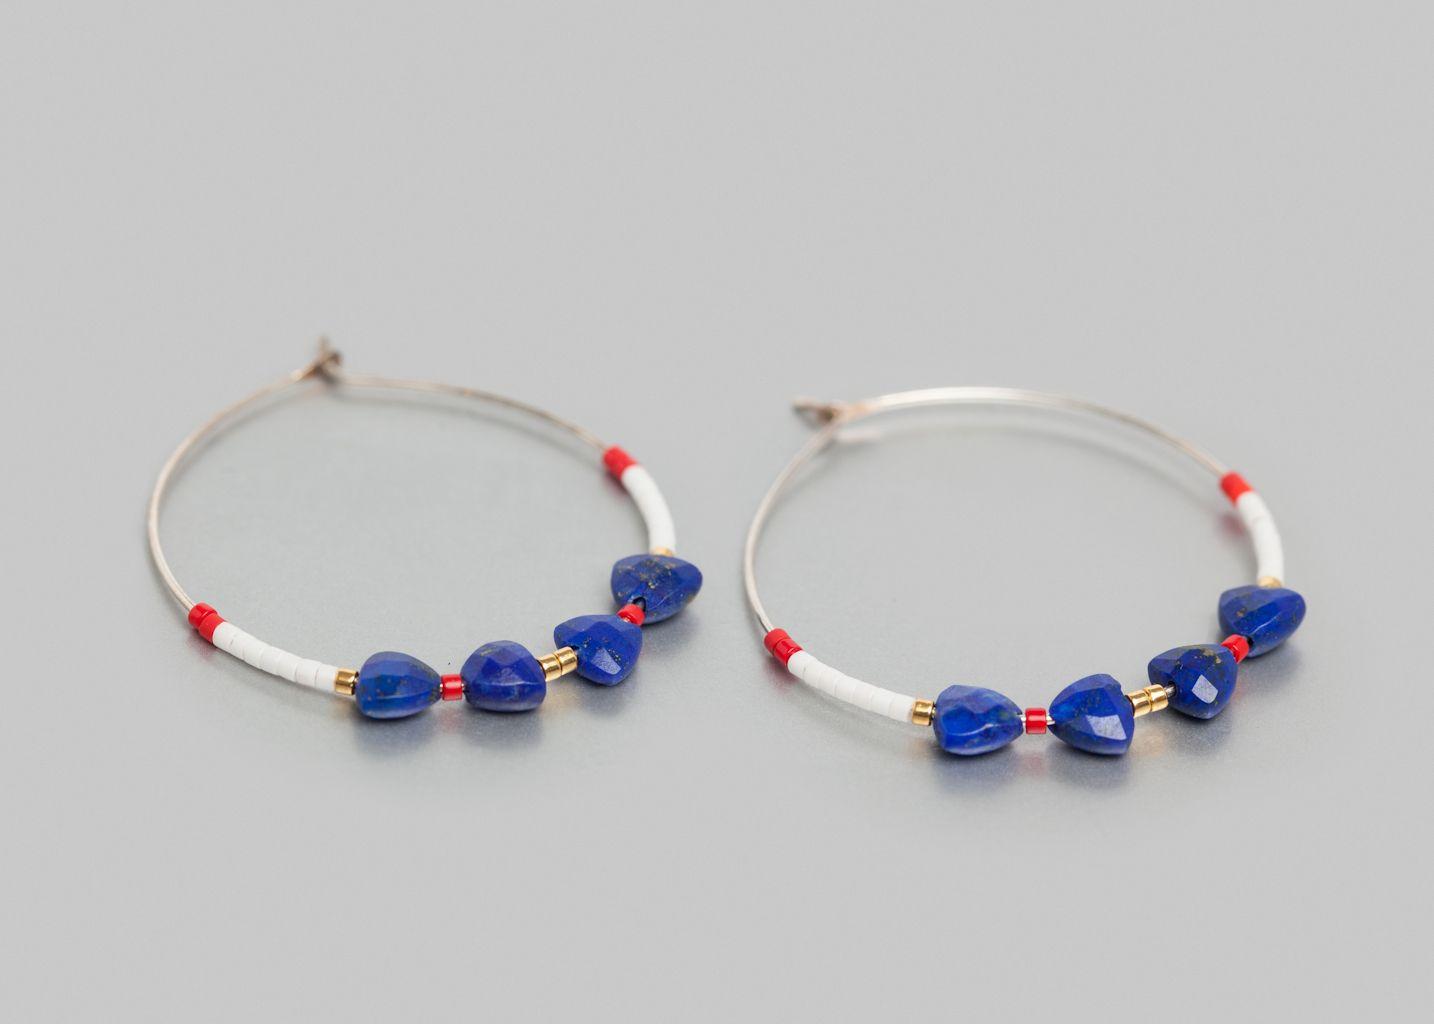 French Kiss Earrings - 46 Bikini Christy